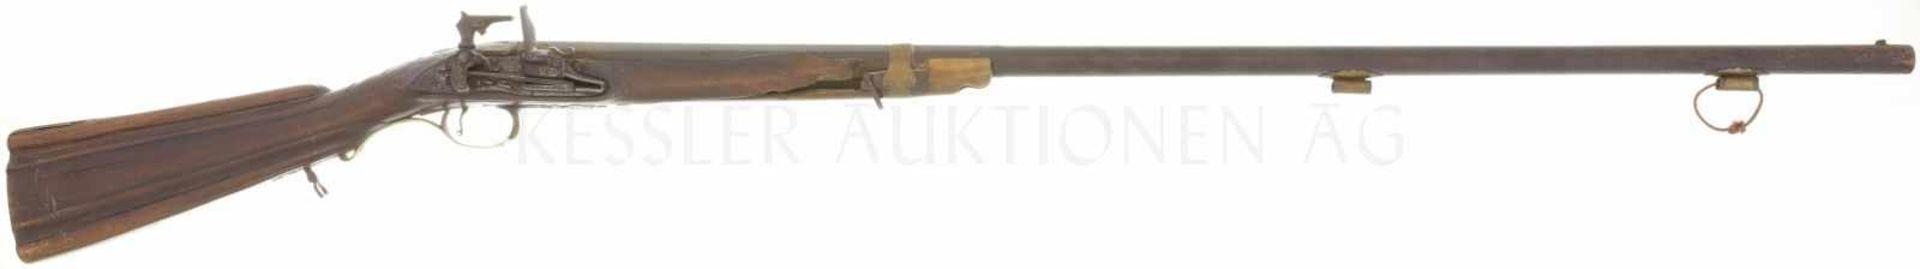 Jagdflinte mit Miqueletschloss, spanisch, Kal. 17.6mm LL 1010mm, TL 1380mm, Rundlauf, hinterer